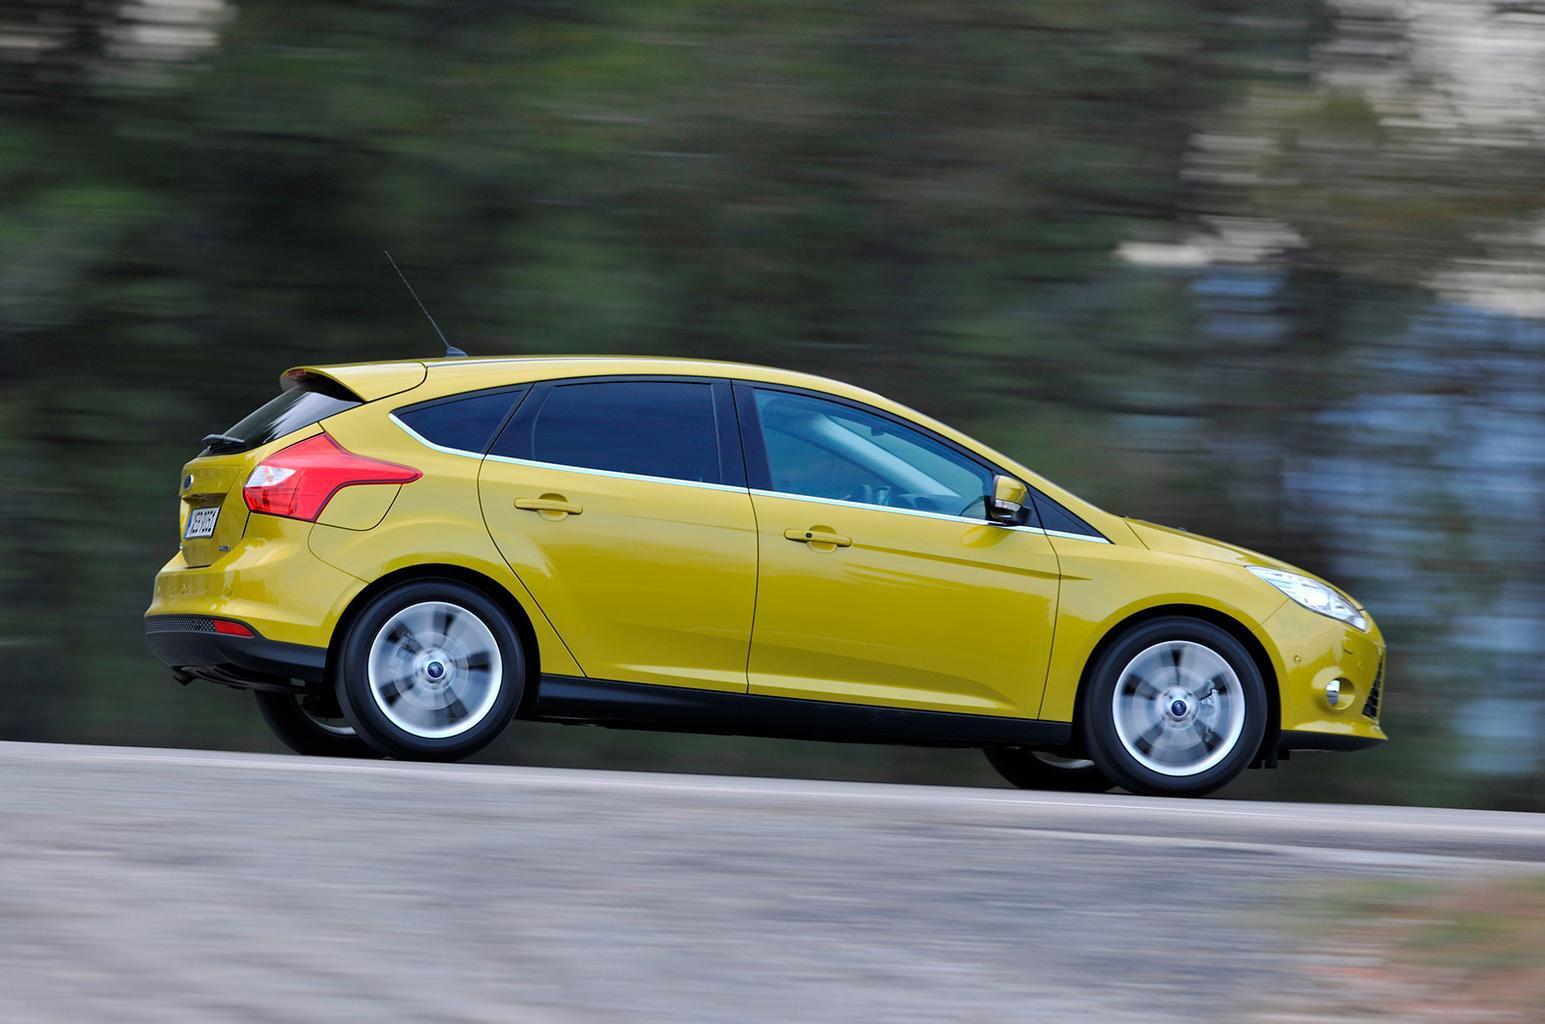 Ford Focus (petrol)